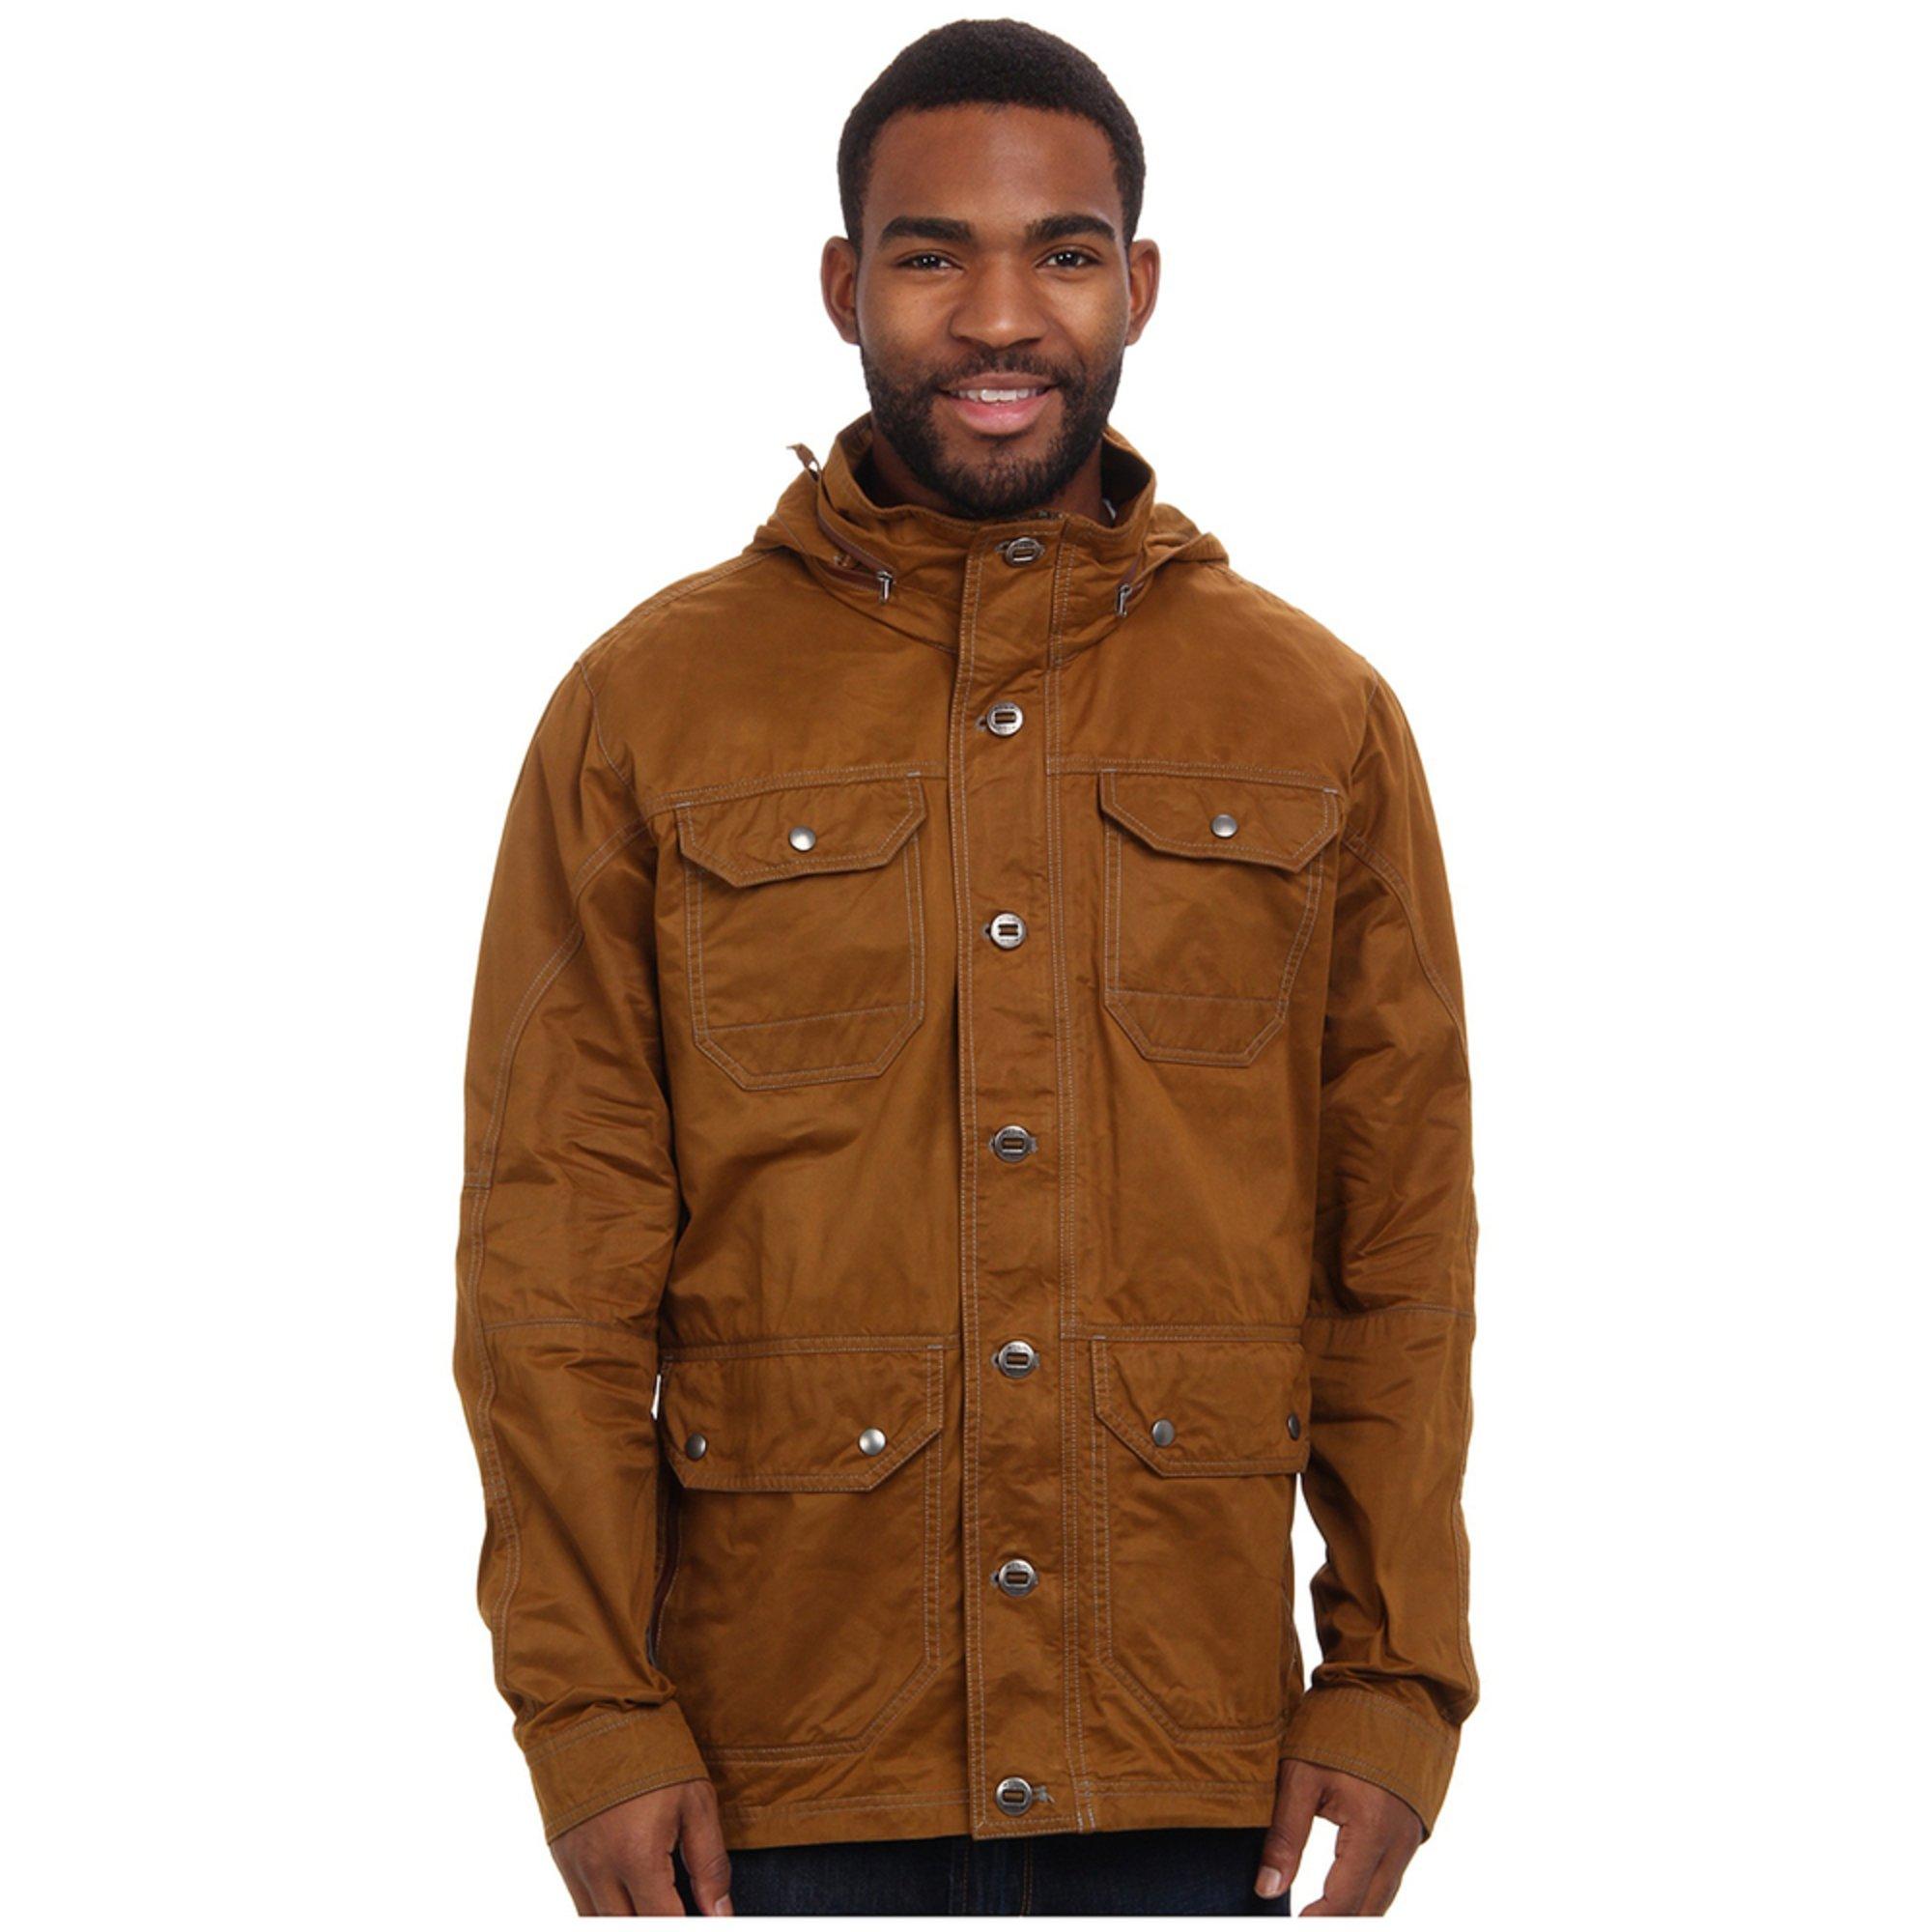 Men s clothing men shop your navy exchange official site